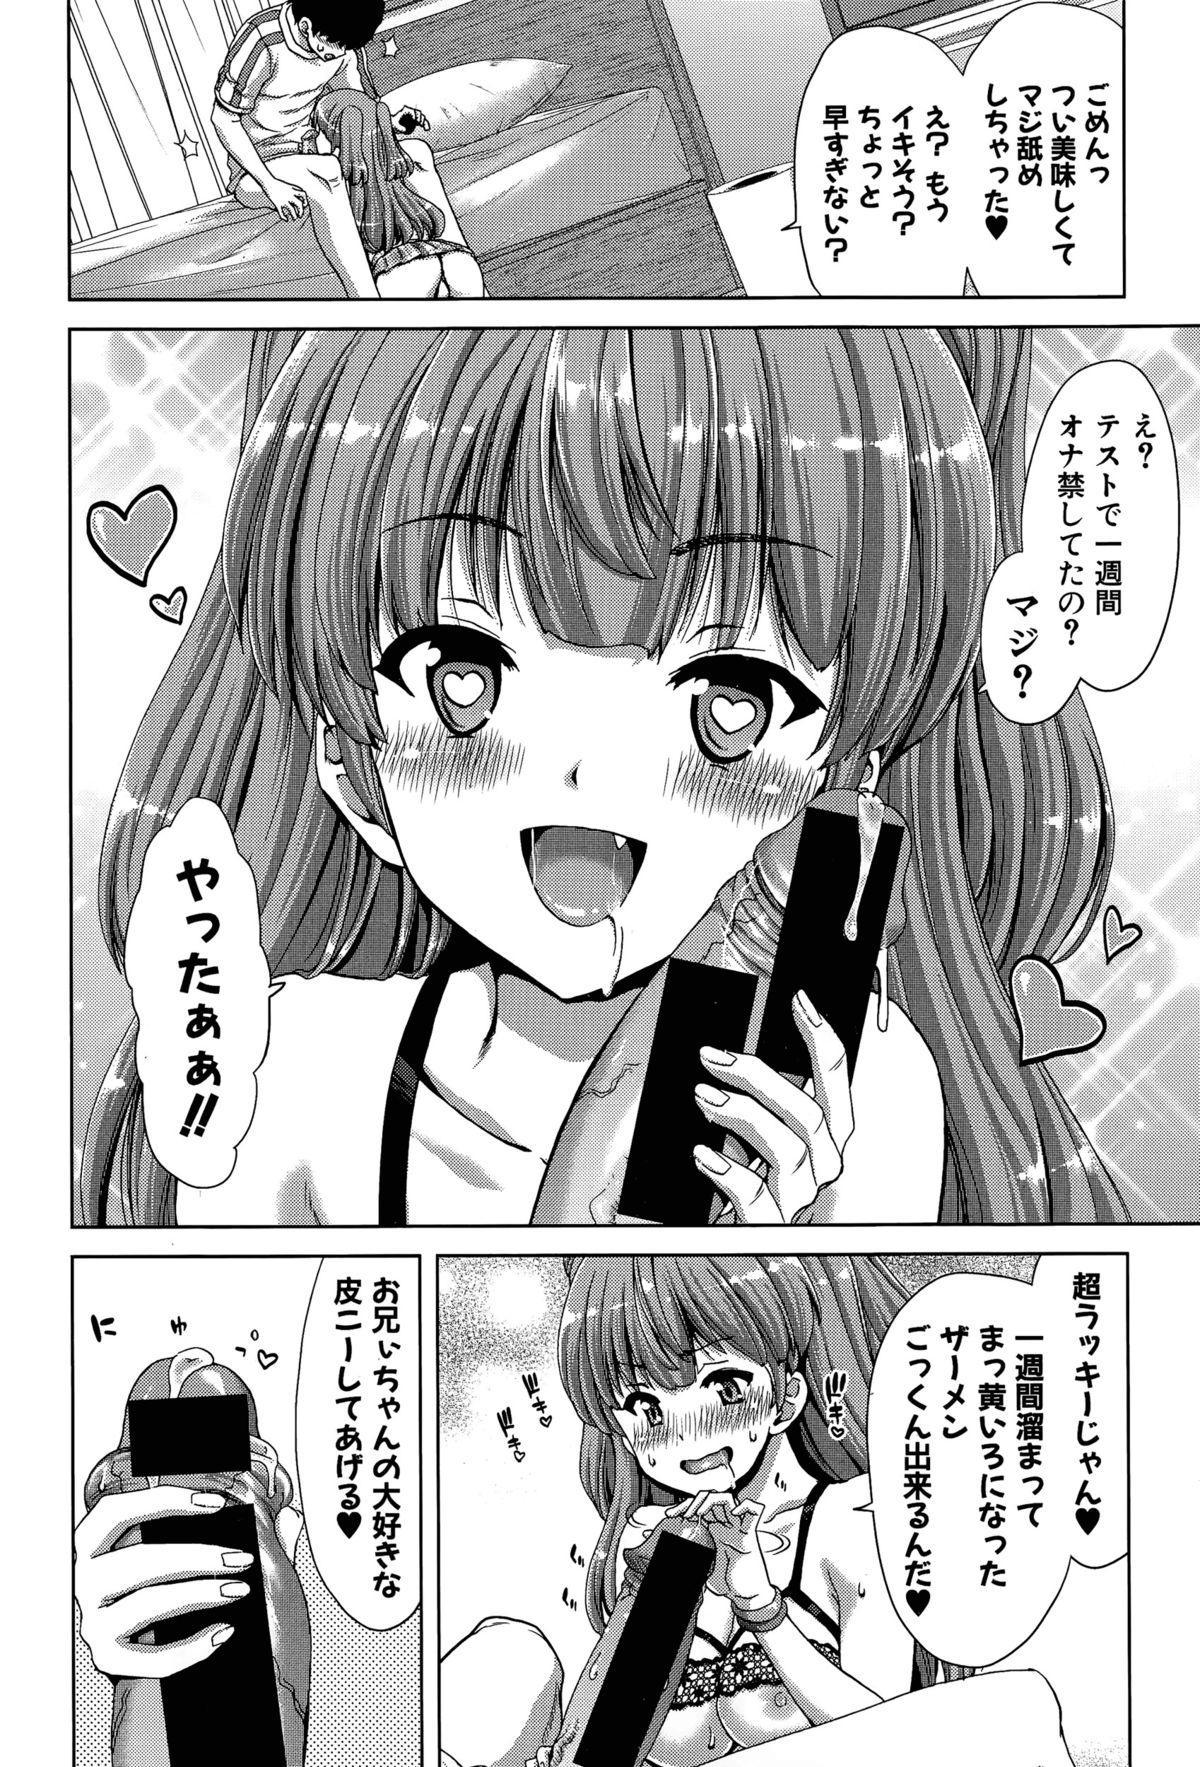 Imouto Sei Shoudou Ch. 1-2 5